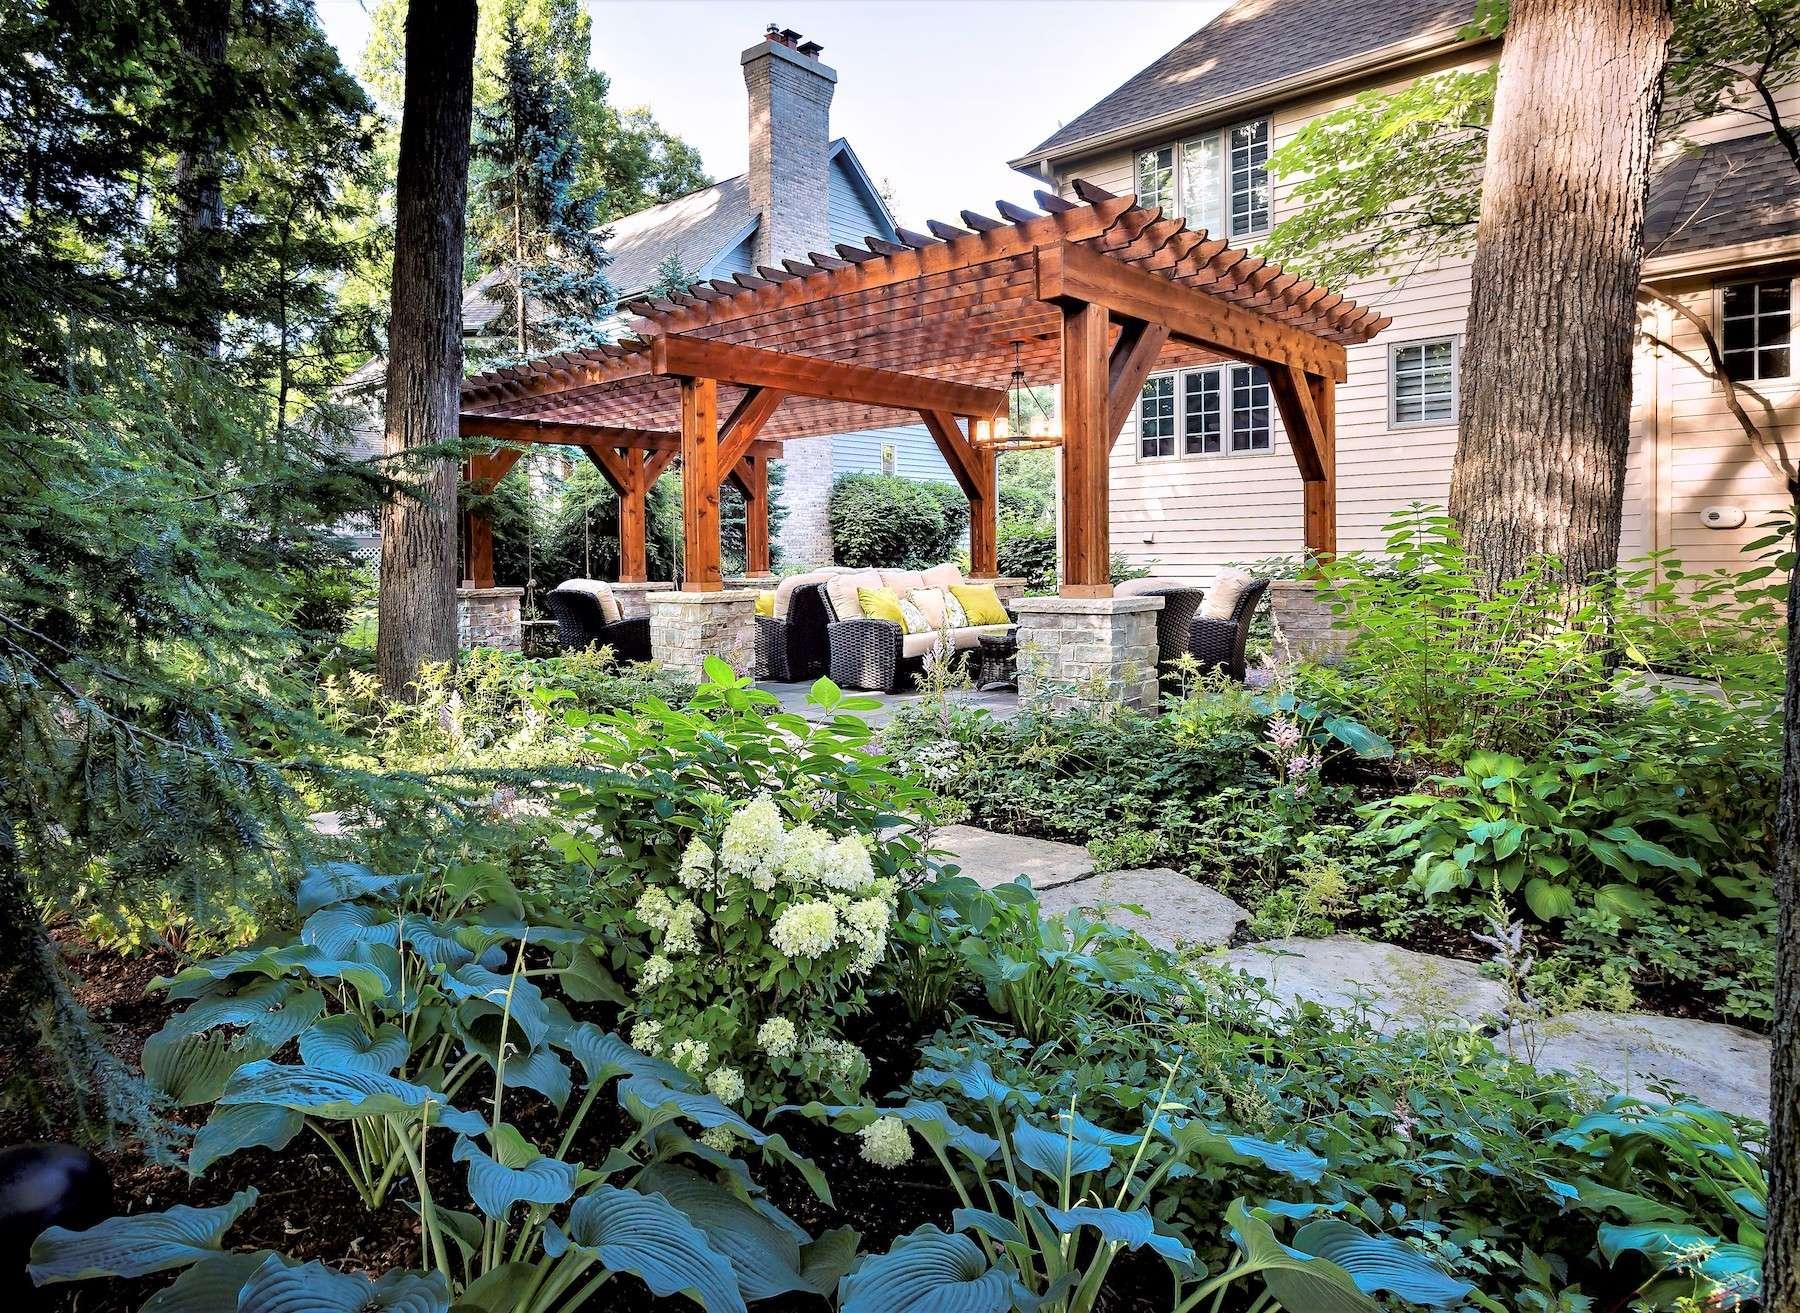 9 Amazing Pergola and Pavilion Design Ideas for Your Backyard